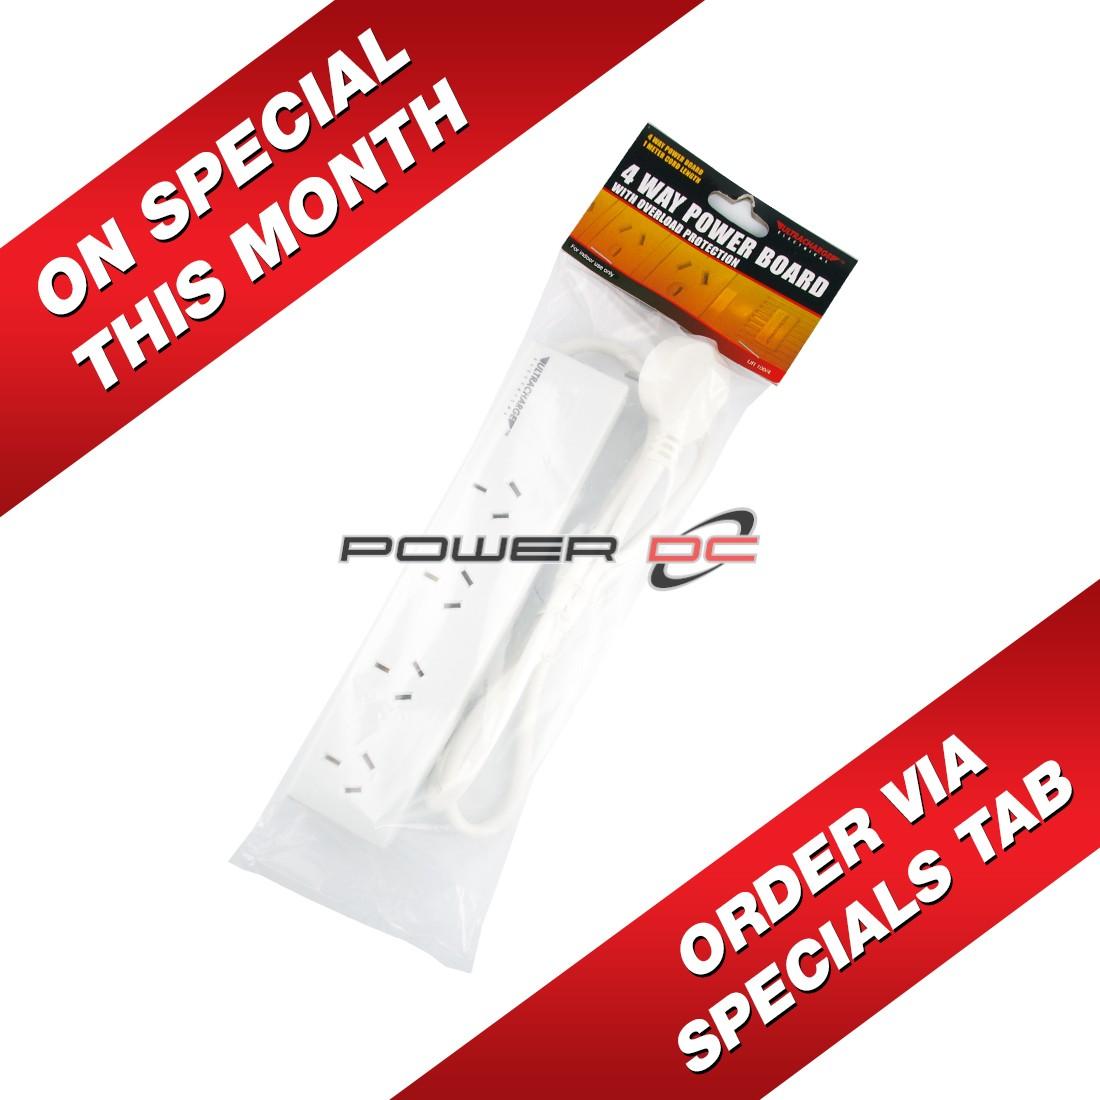 ULTRACHARGE POWER BOARD 4 WAY